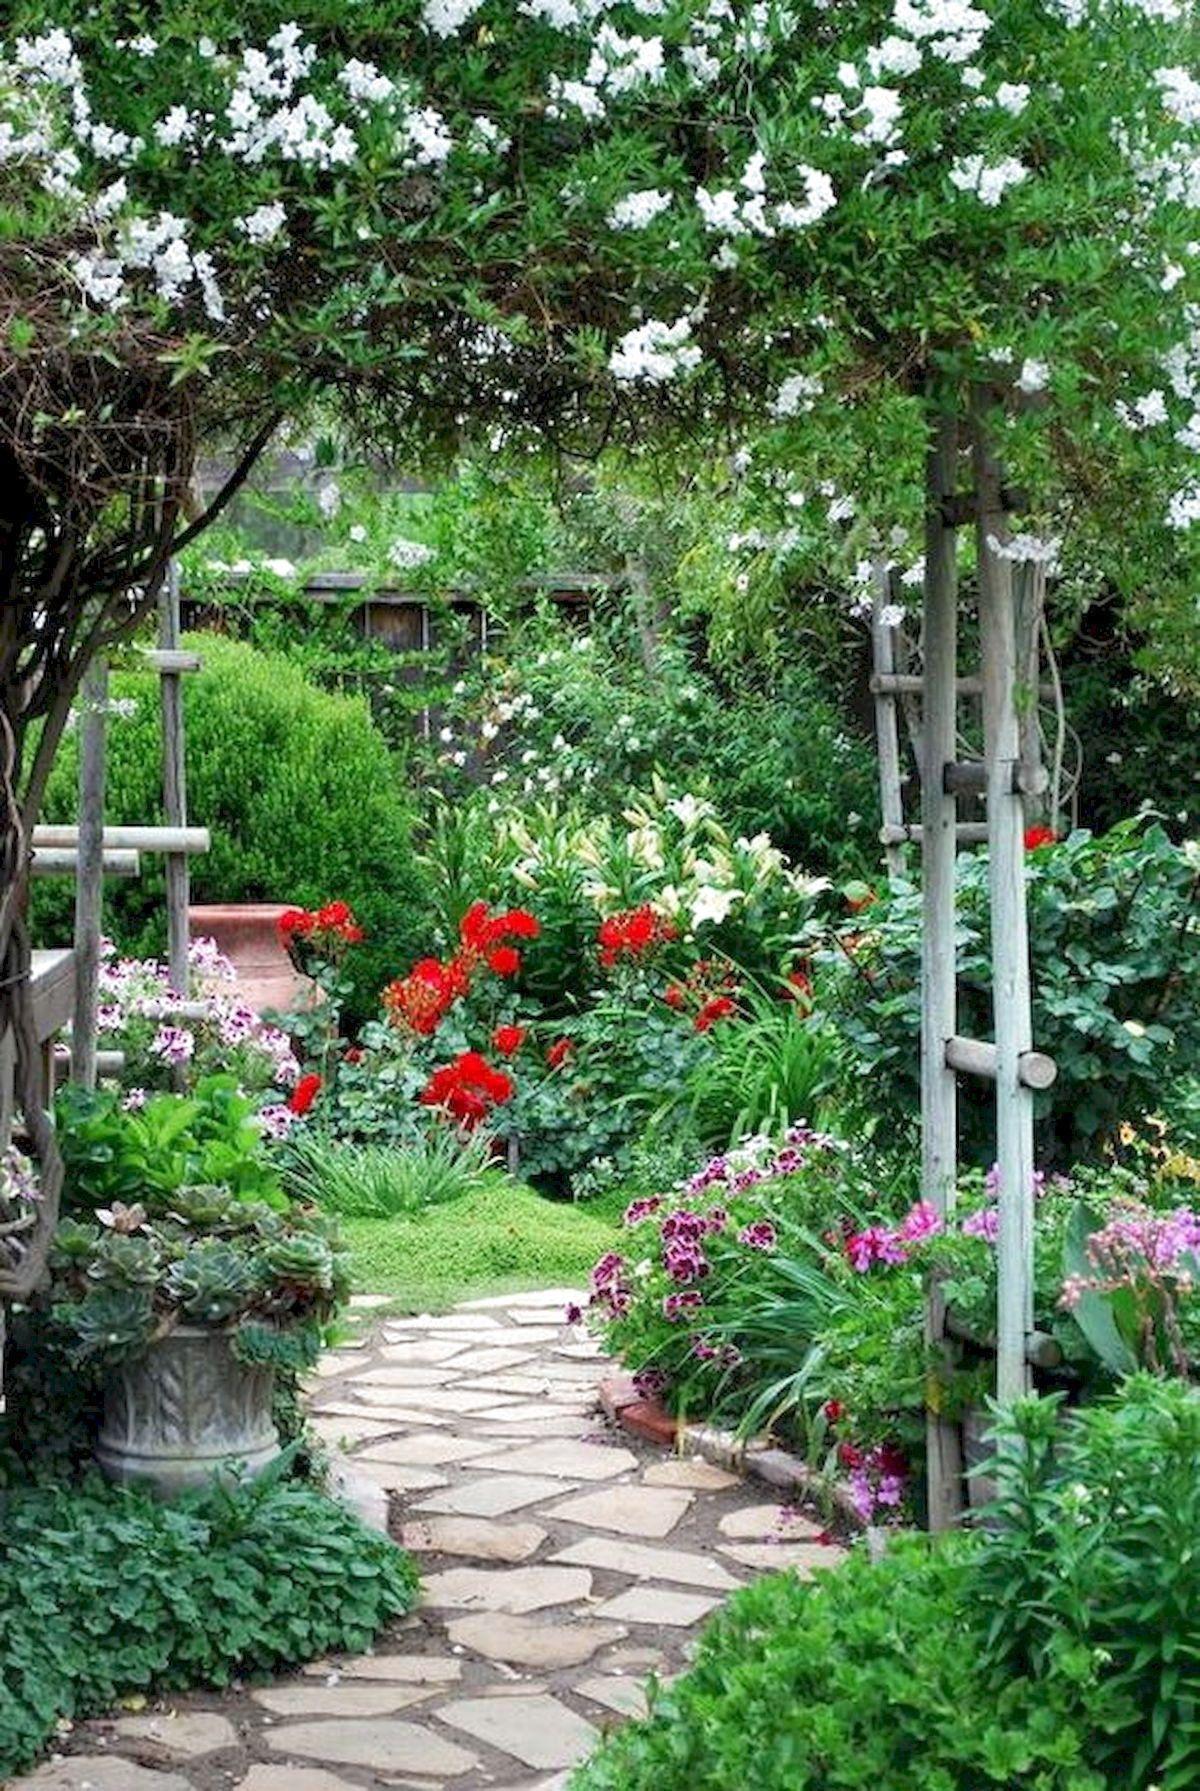 77 Favourite Pinterest Garden Decor Ideas In 2020 Amazing